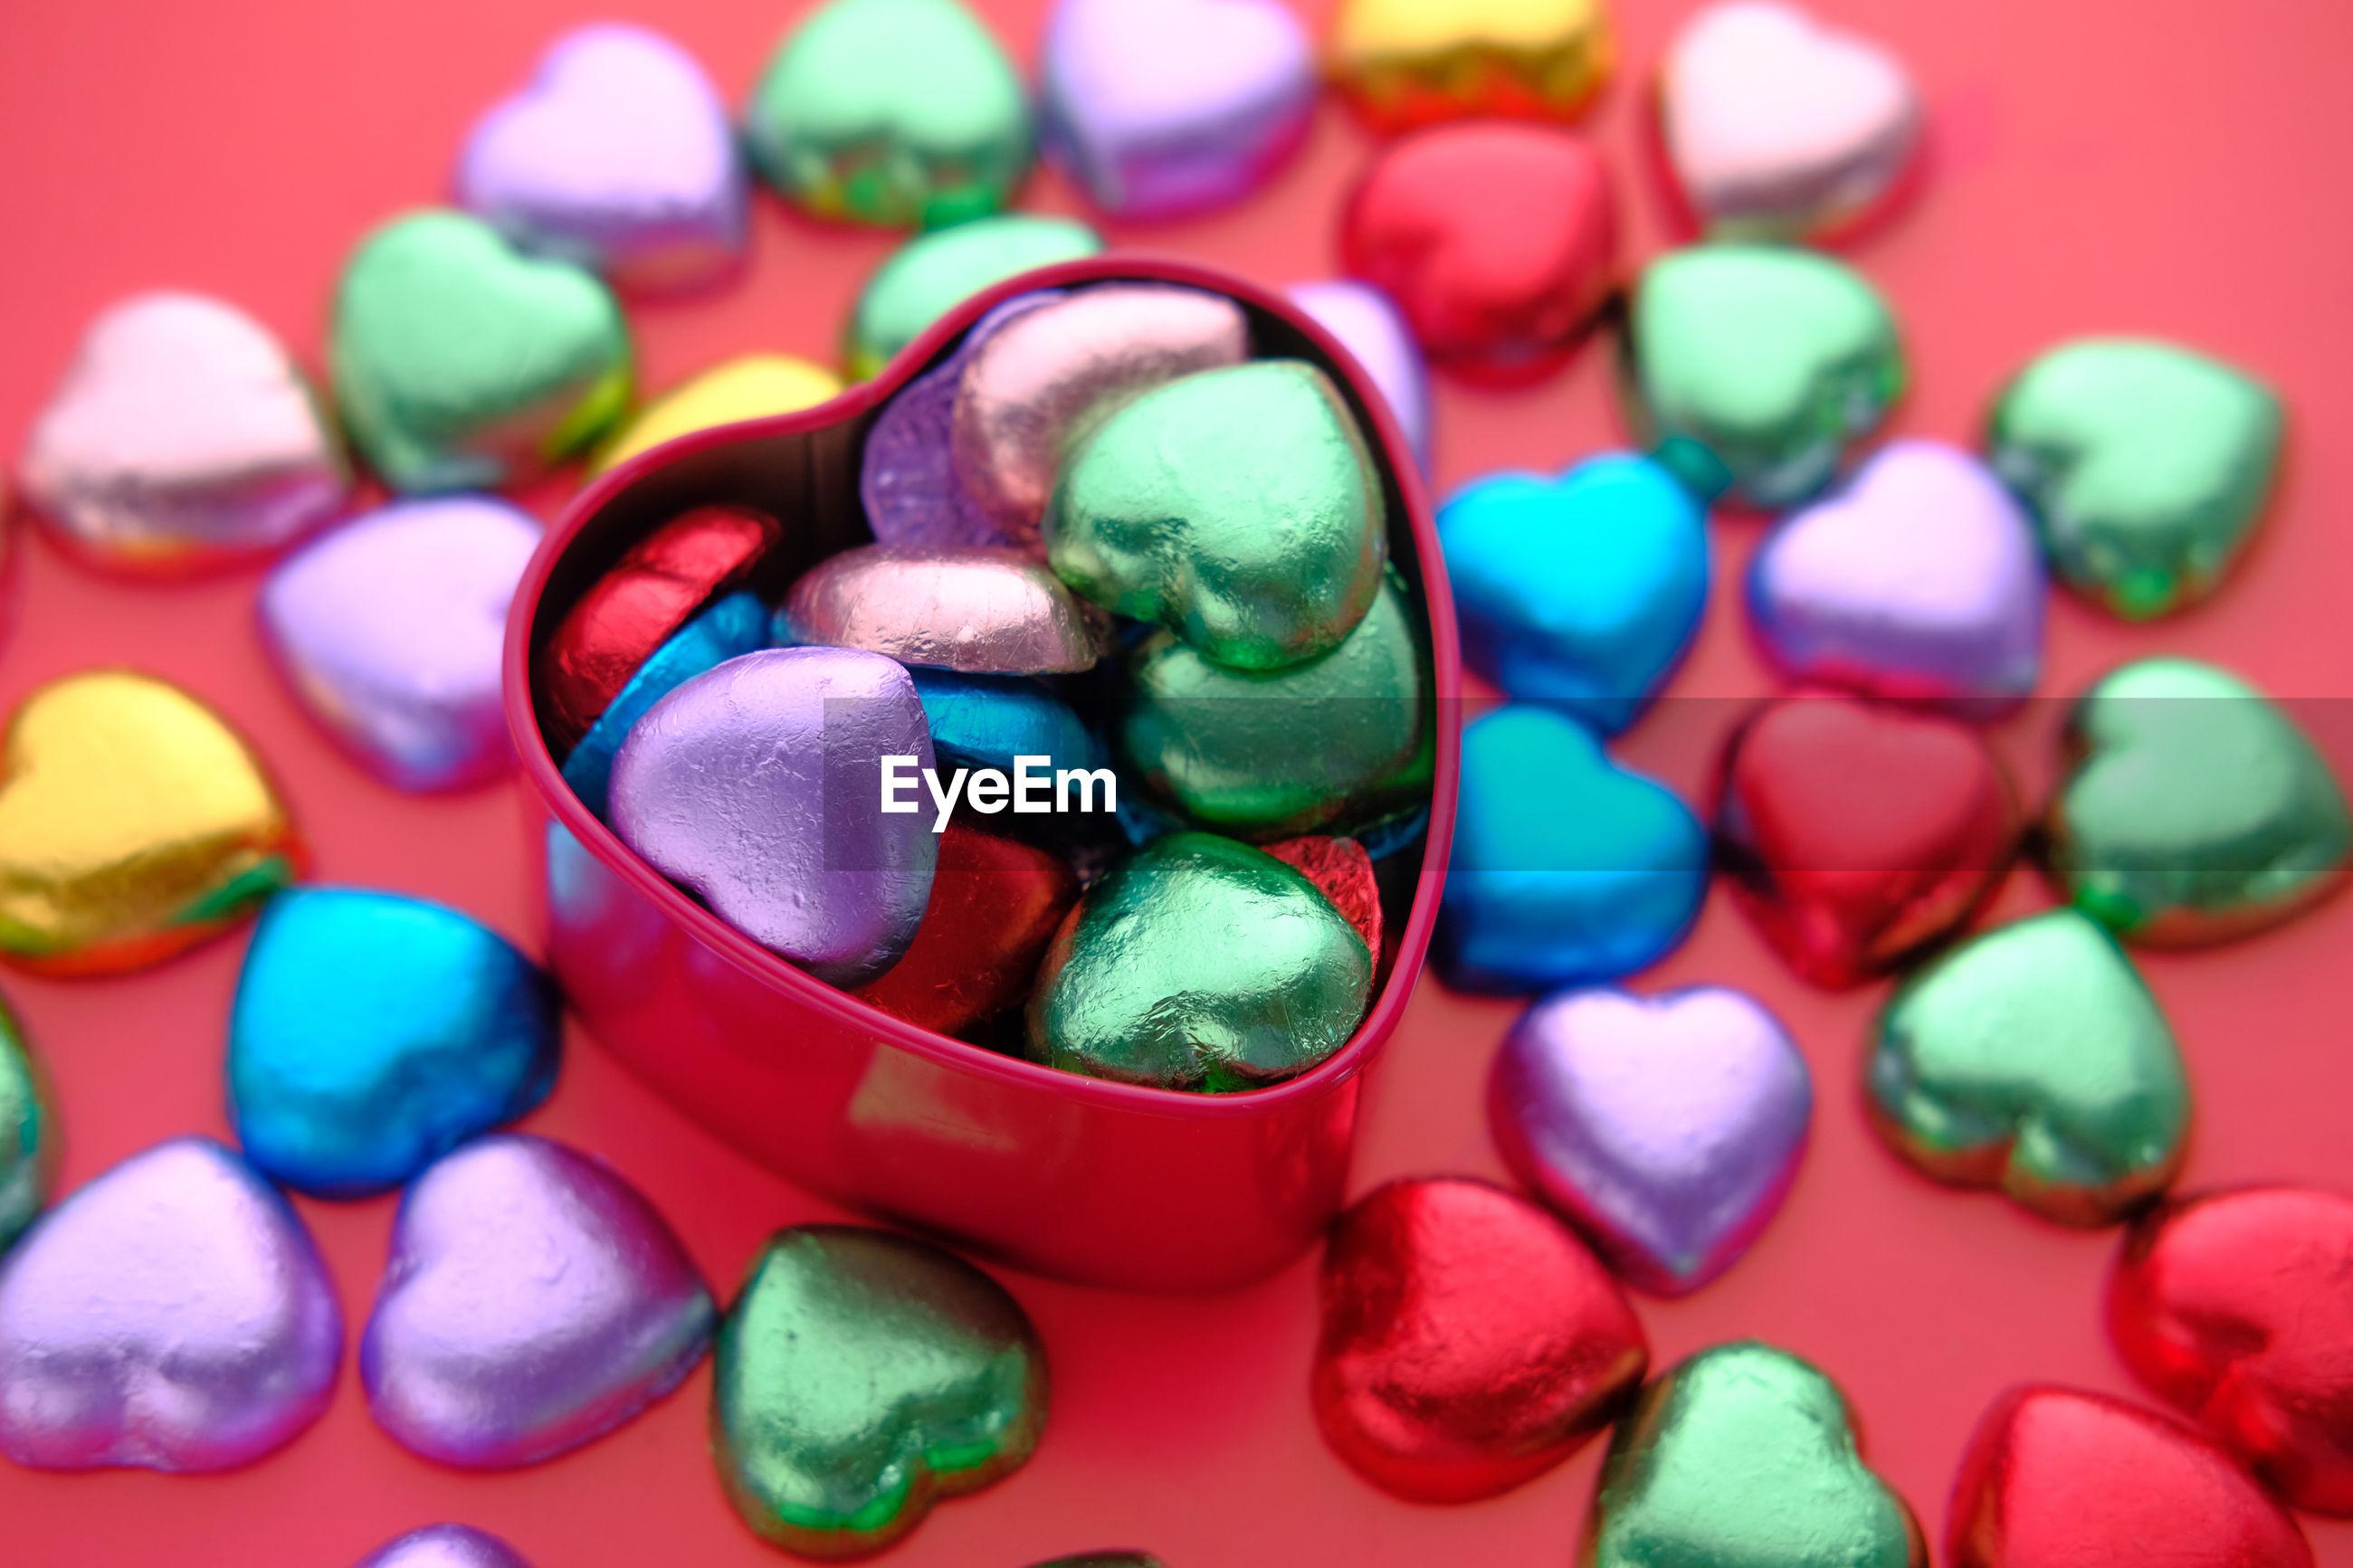 Heart shape candy in a box